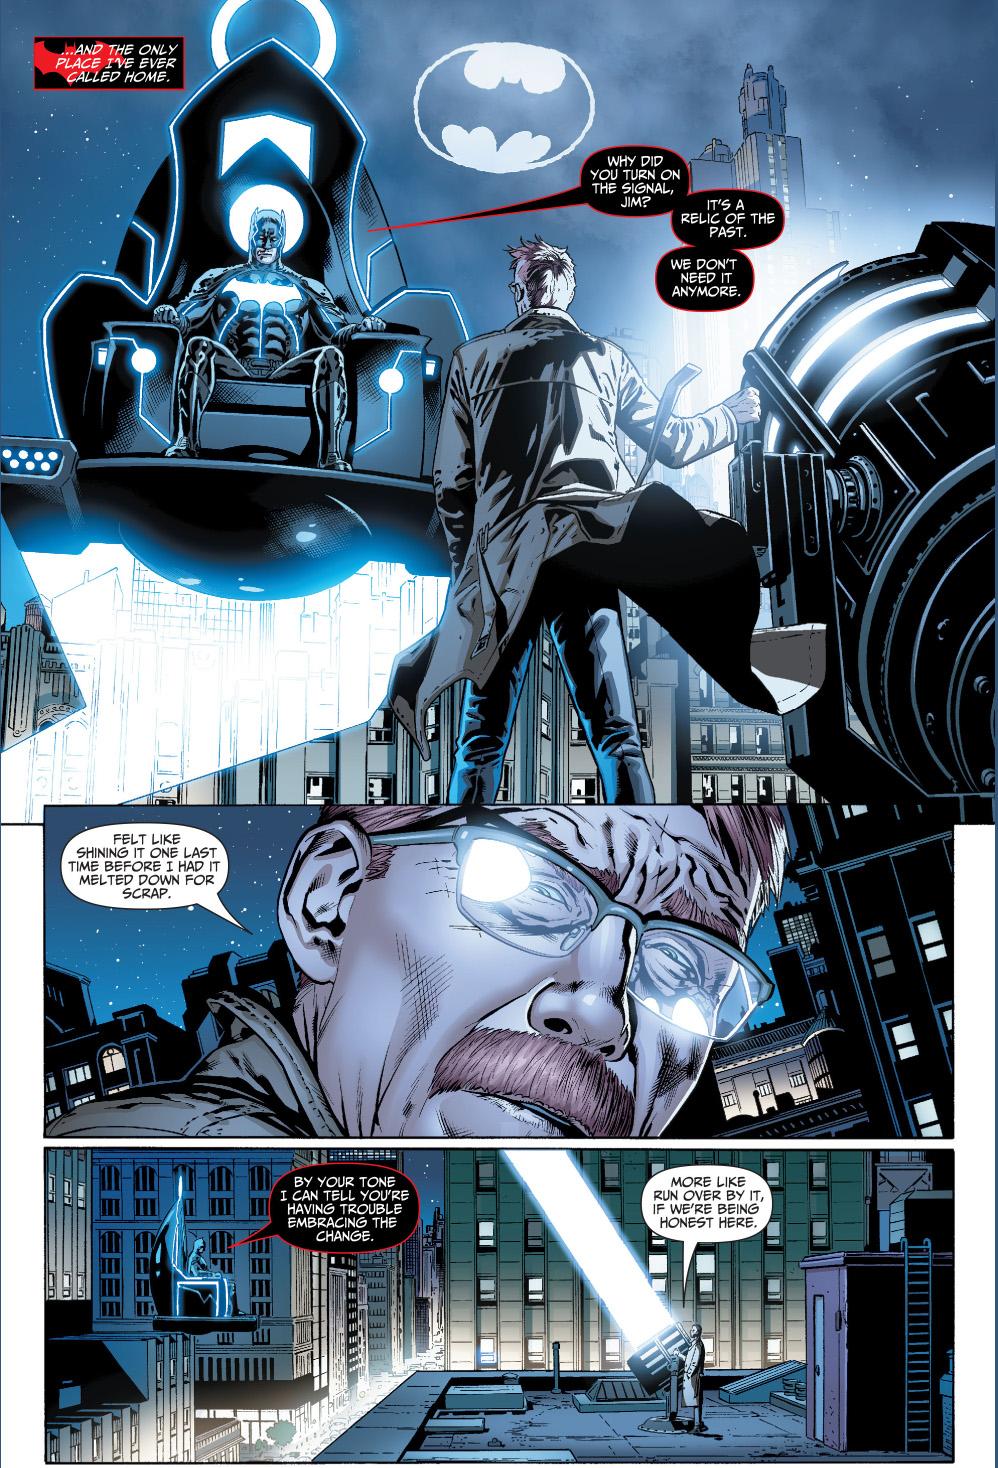 jim gordonu0027s problem with batgod & mobius chair | Comicnewbies